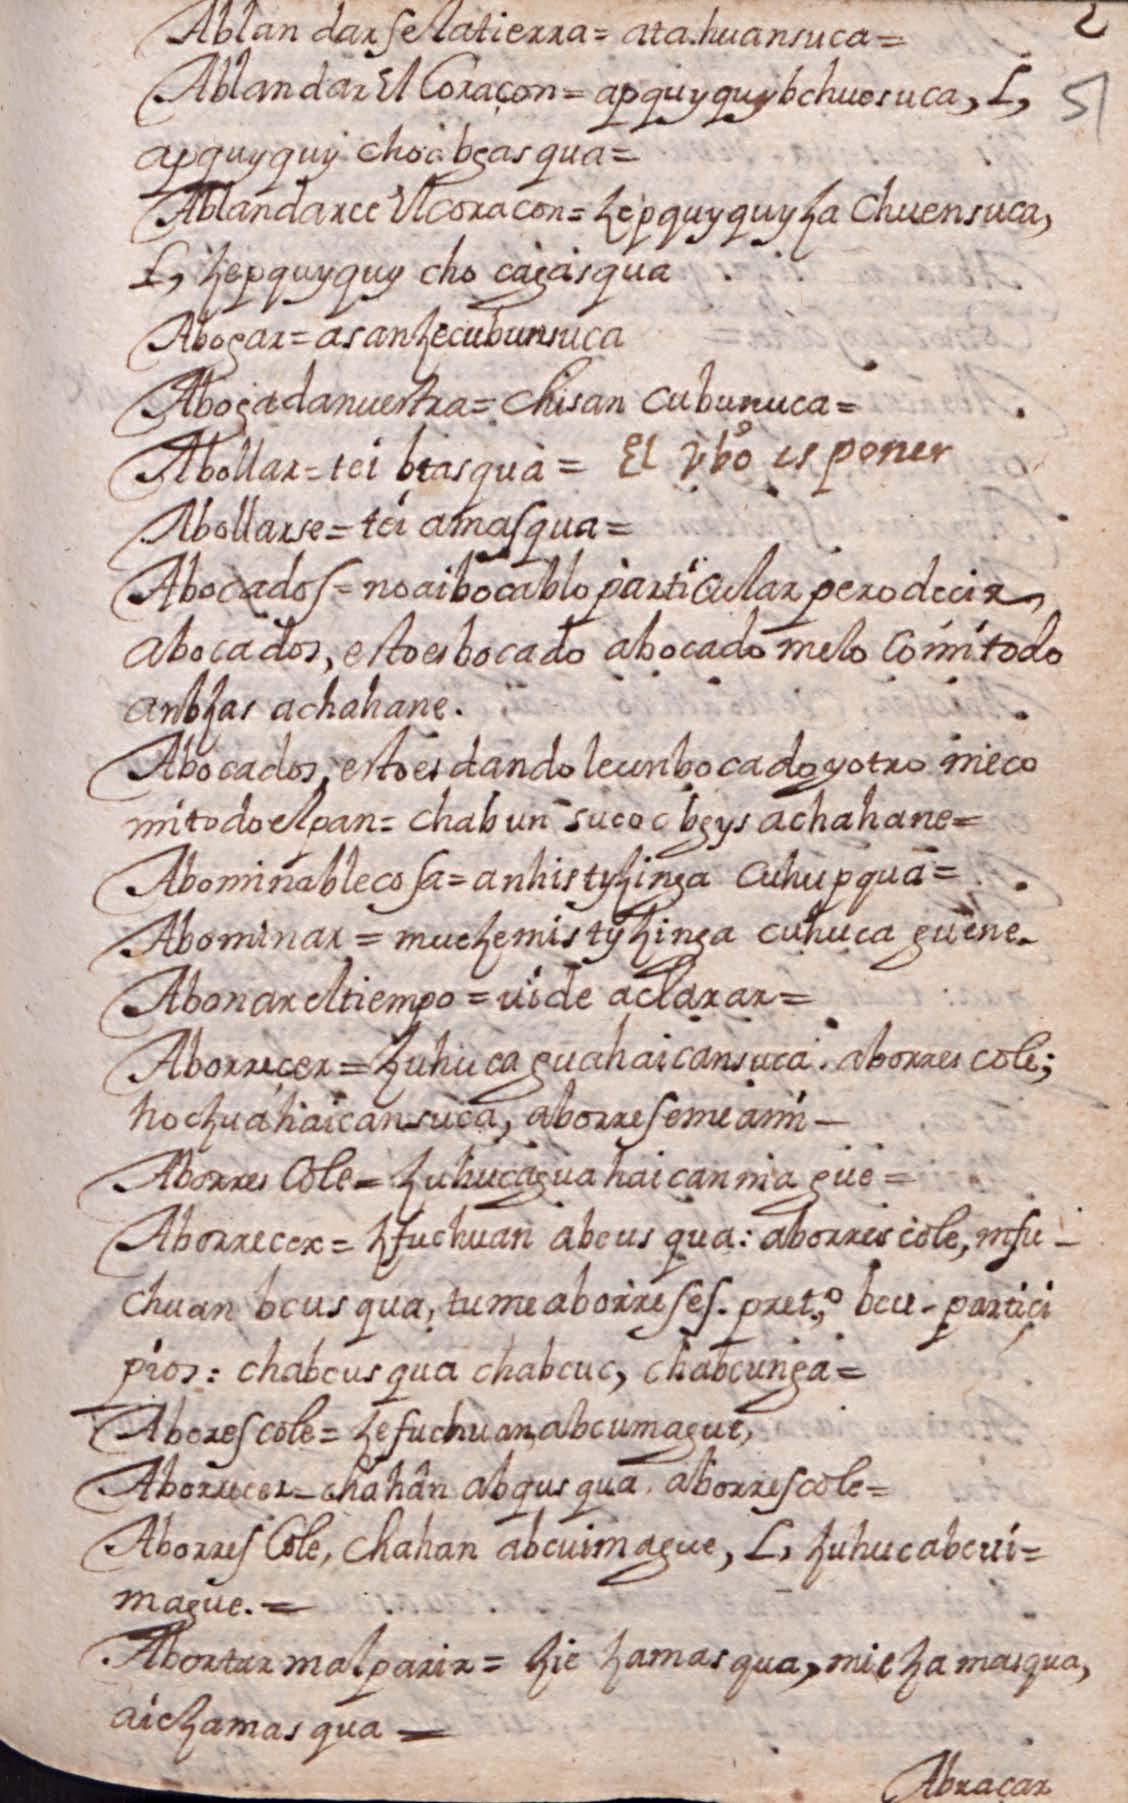 Manuscrito 158 BNC Vocabulario - fol 2r.jpg